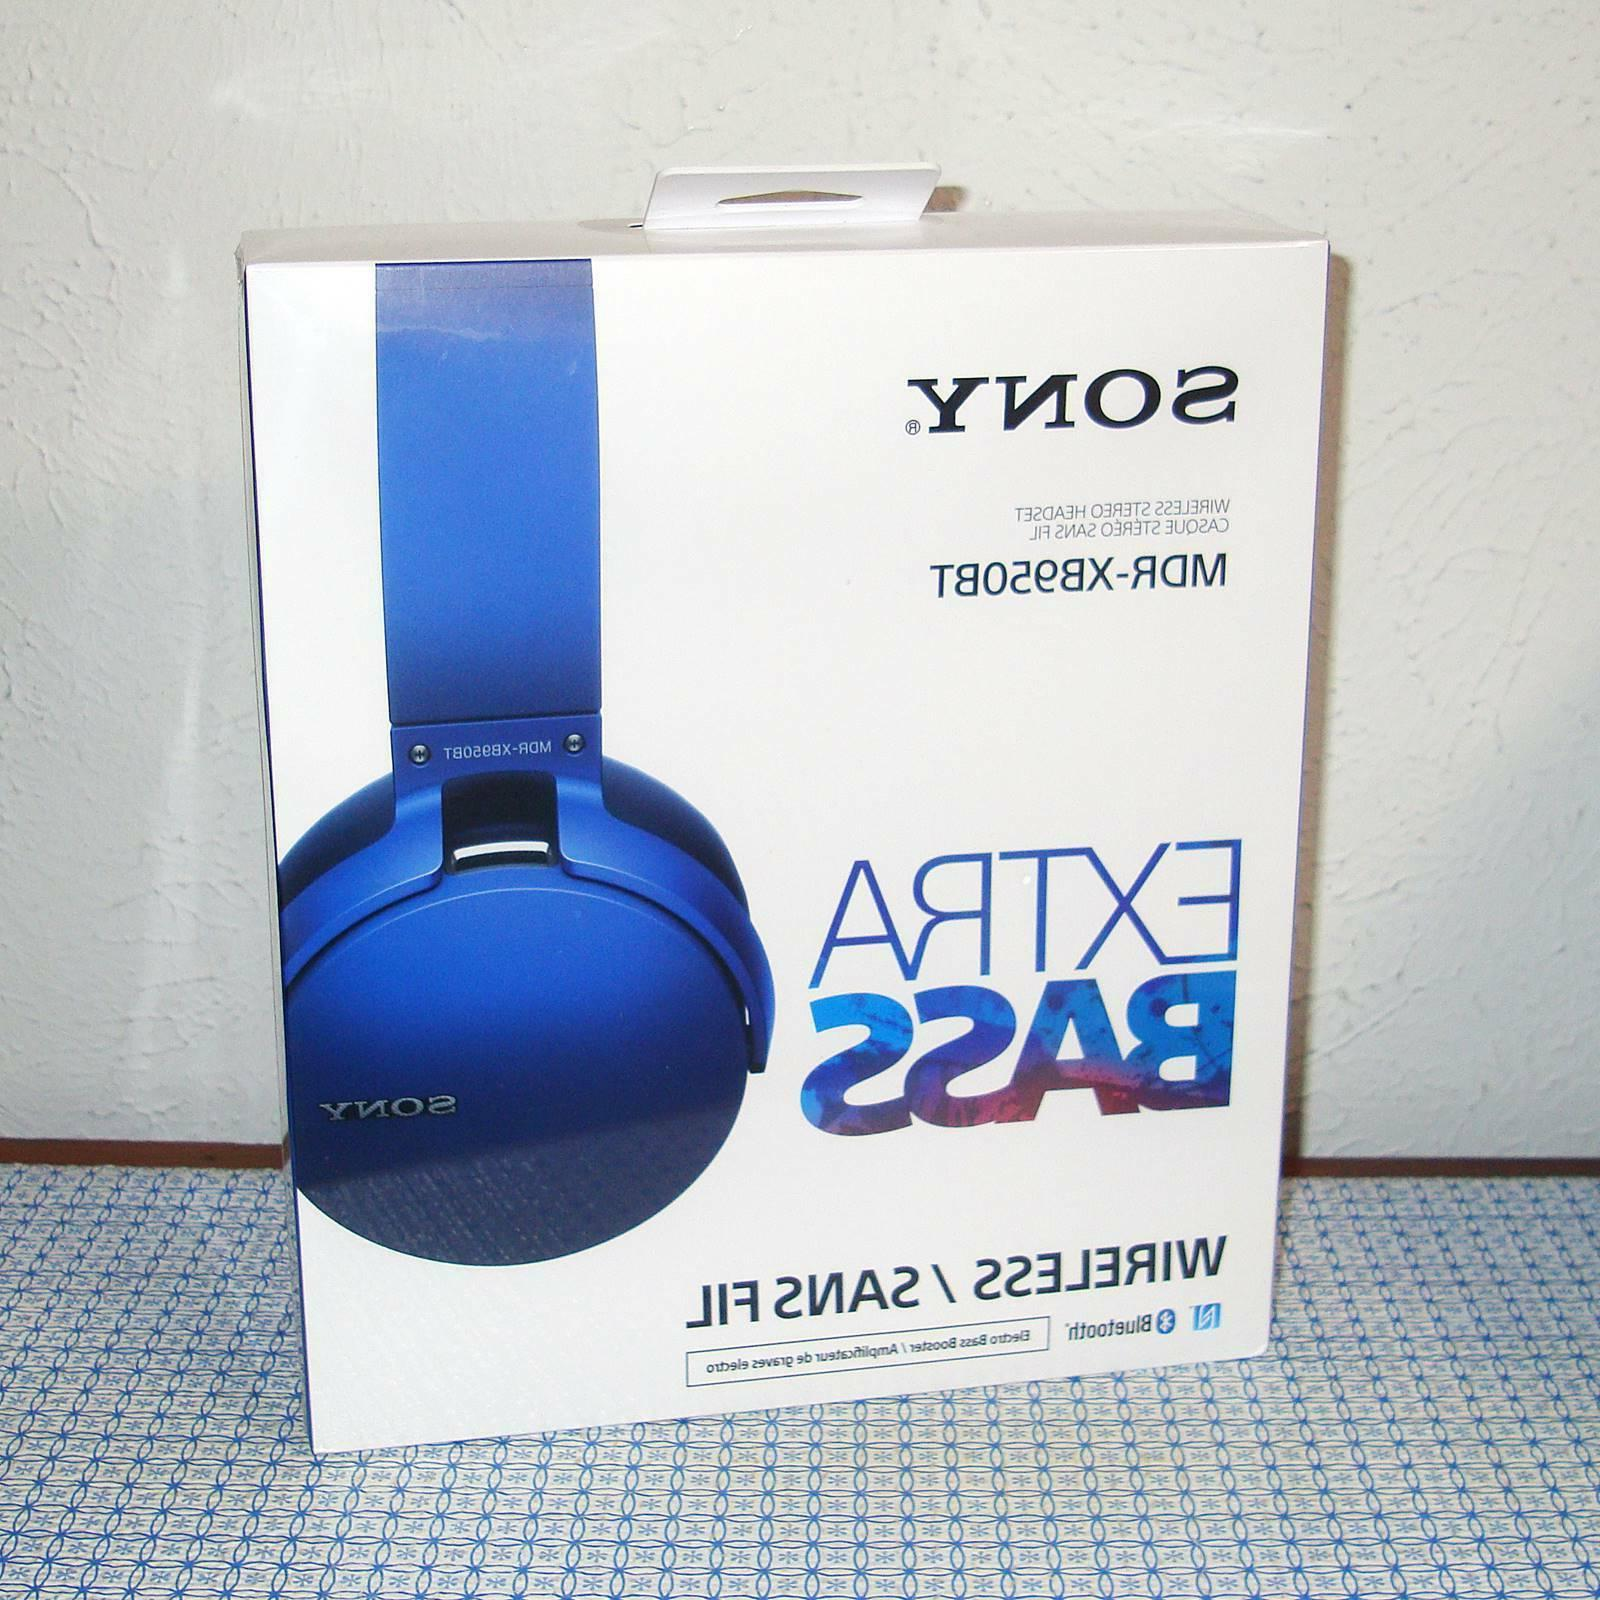 new mdrxb950bt b extra bass bluetooth headphones